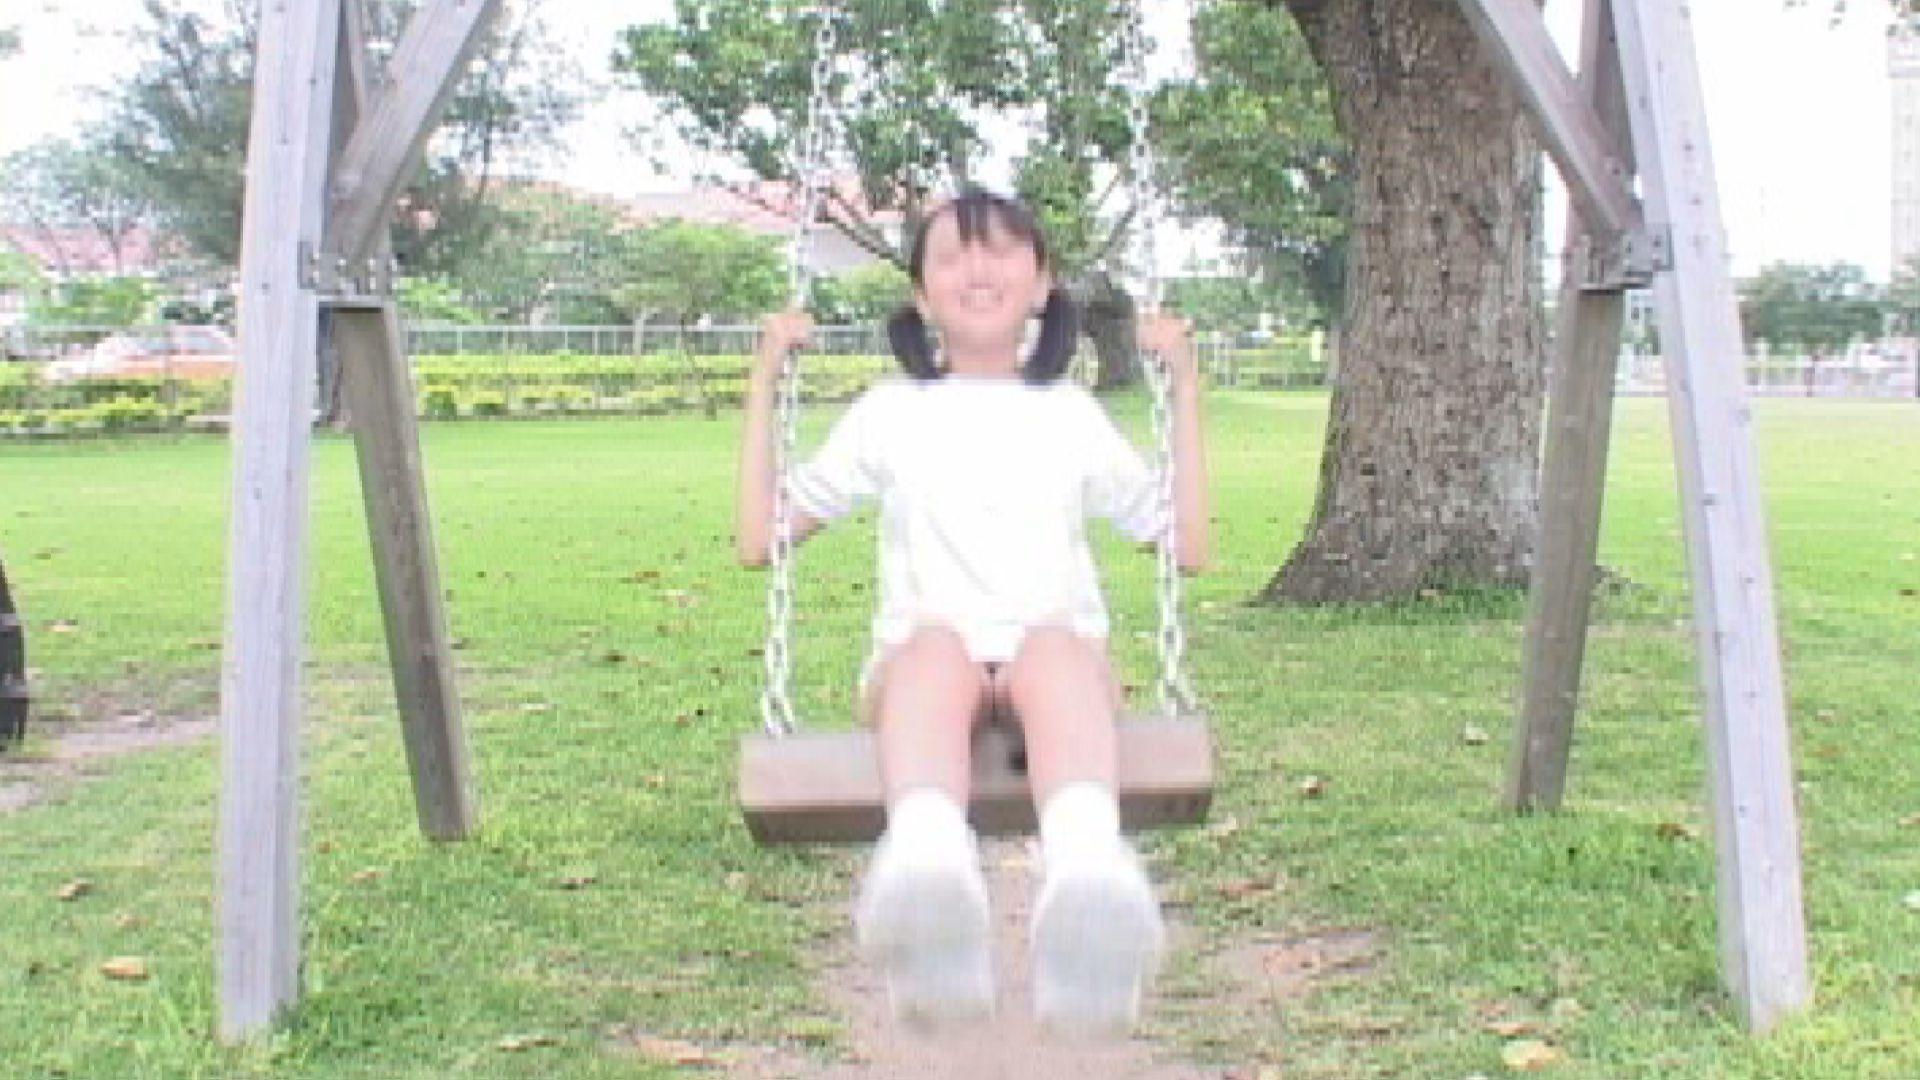 mayumi vol.2 / まゆみ 11